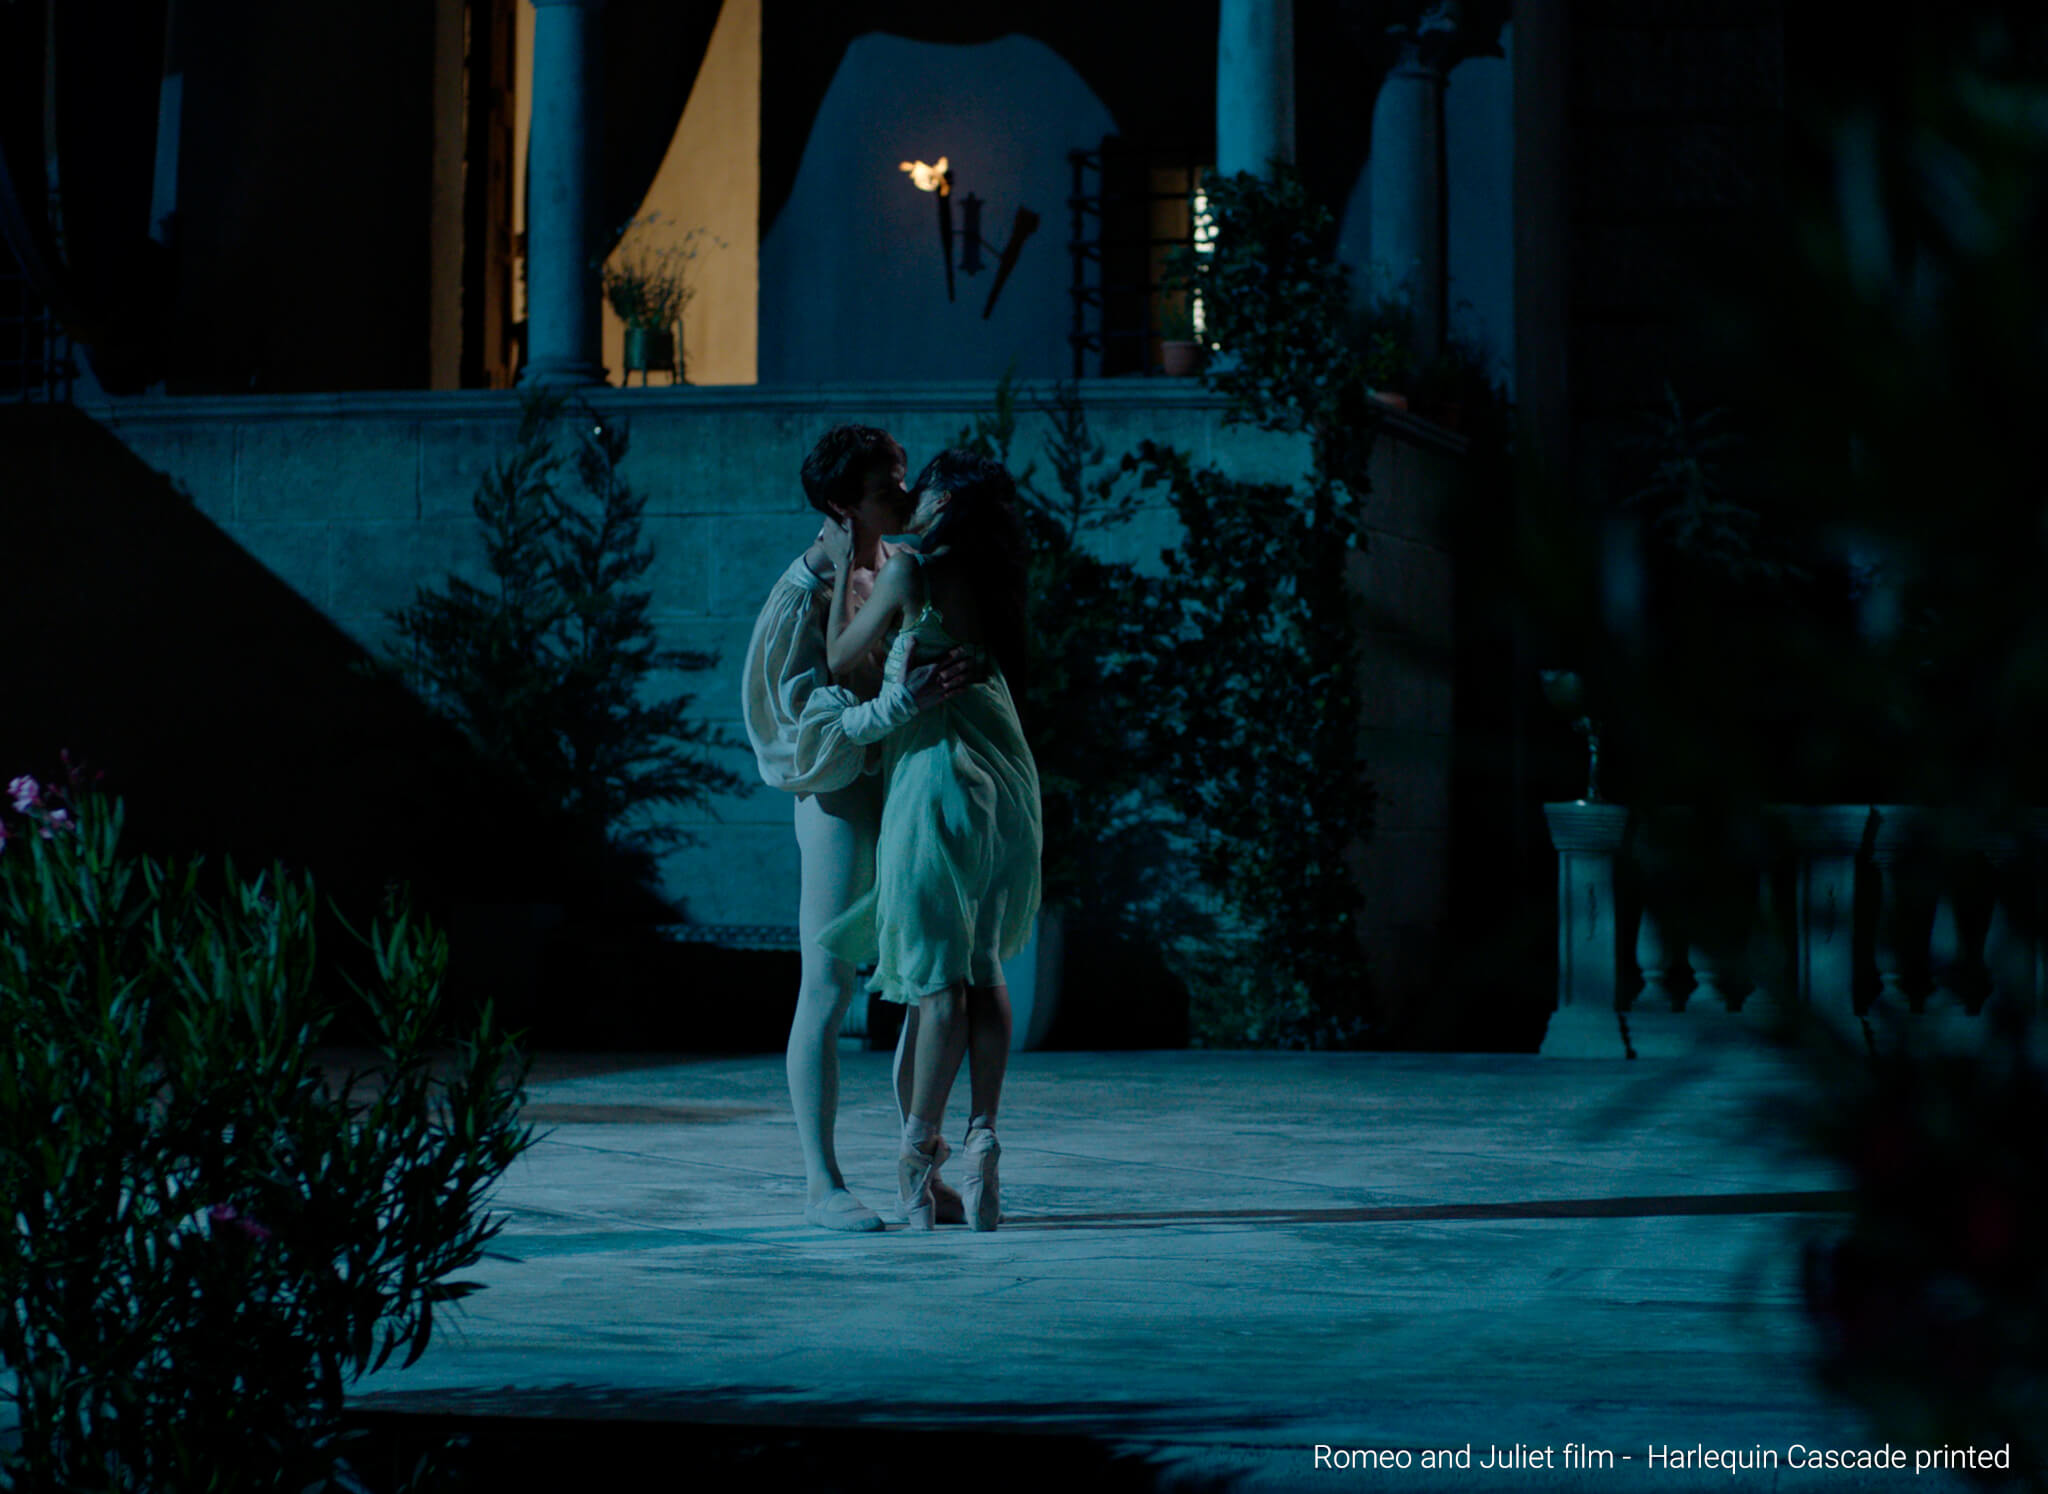 Romeo and Juliet 22 502 688